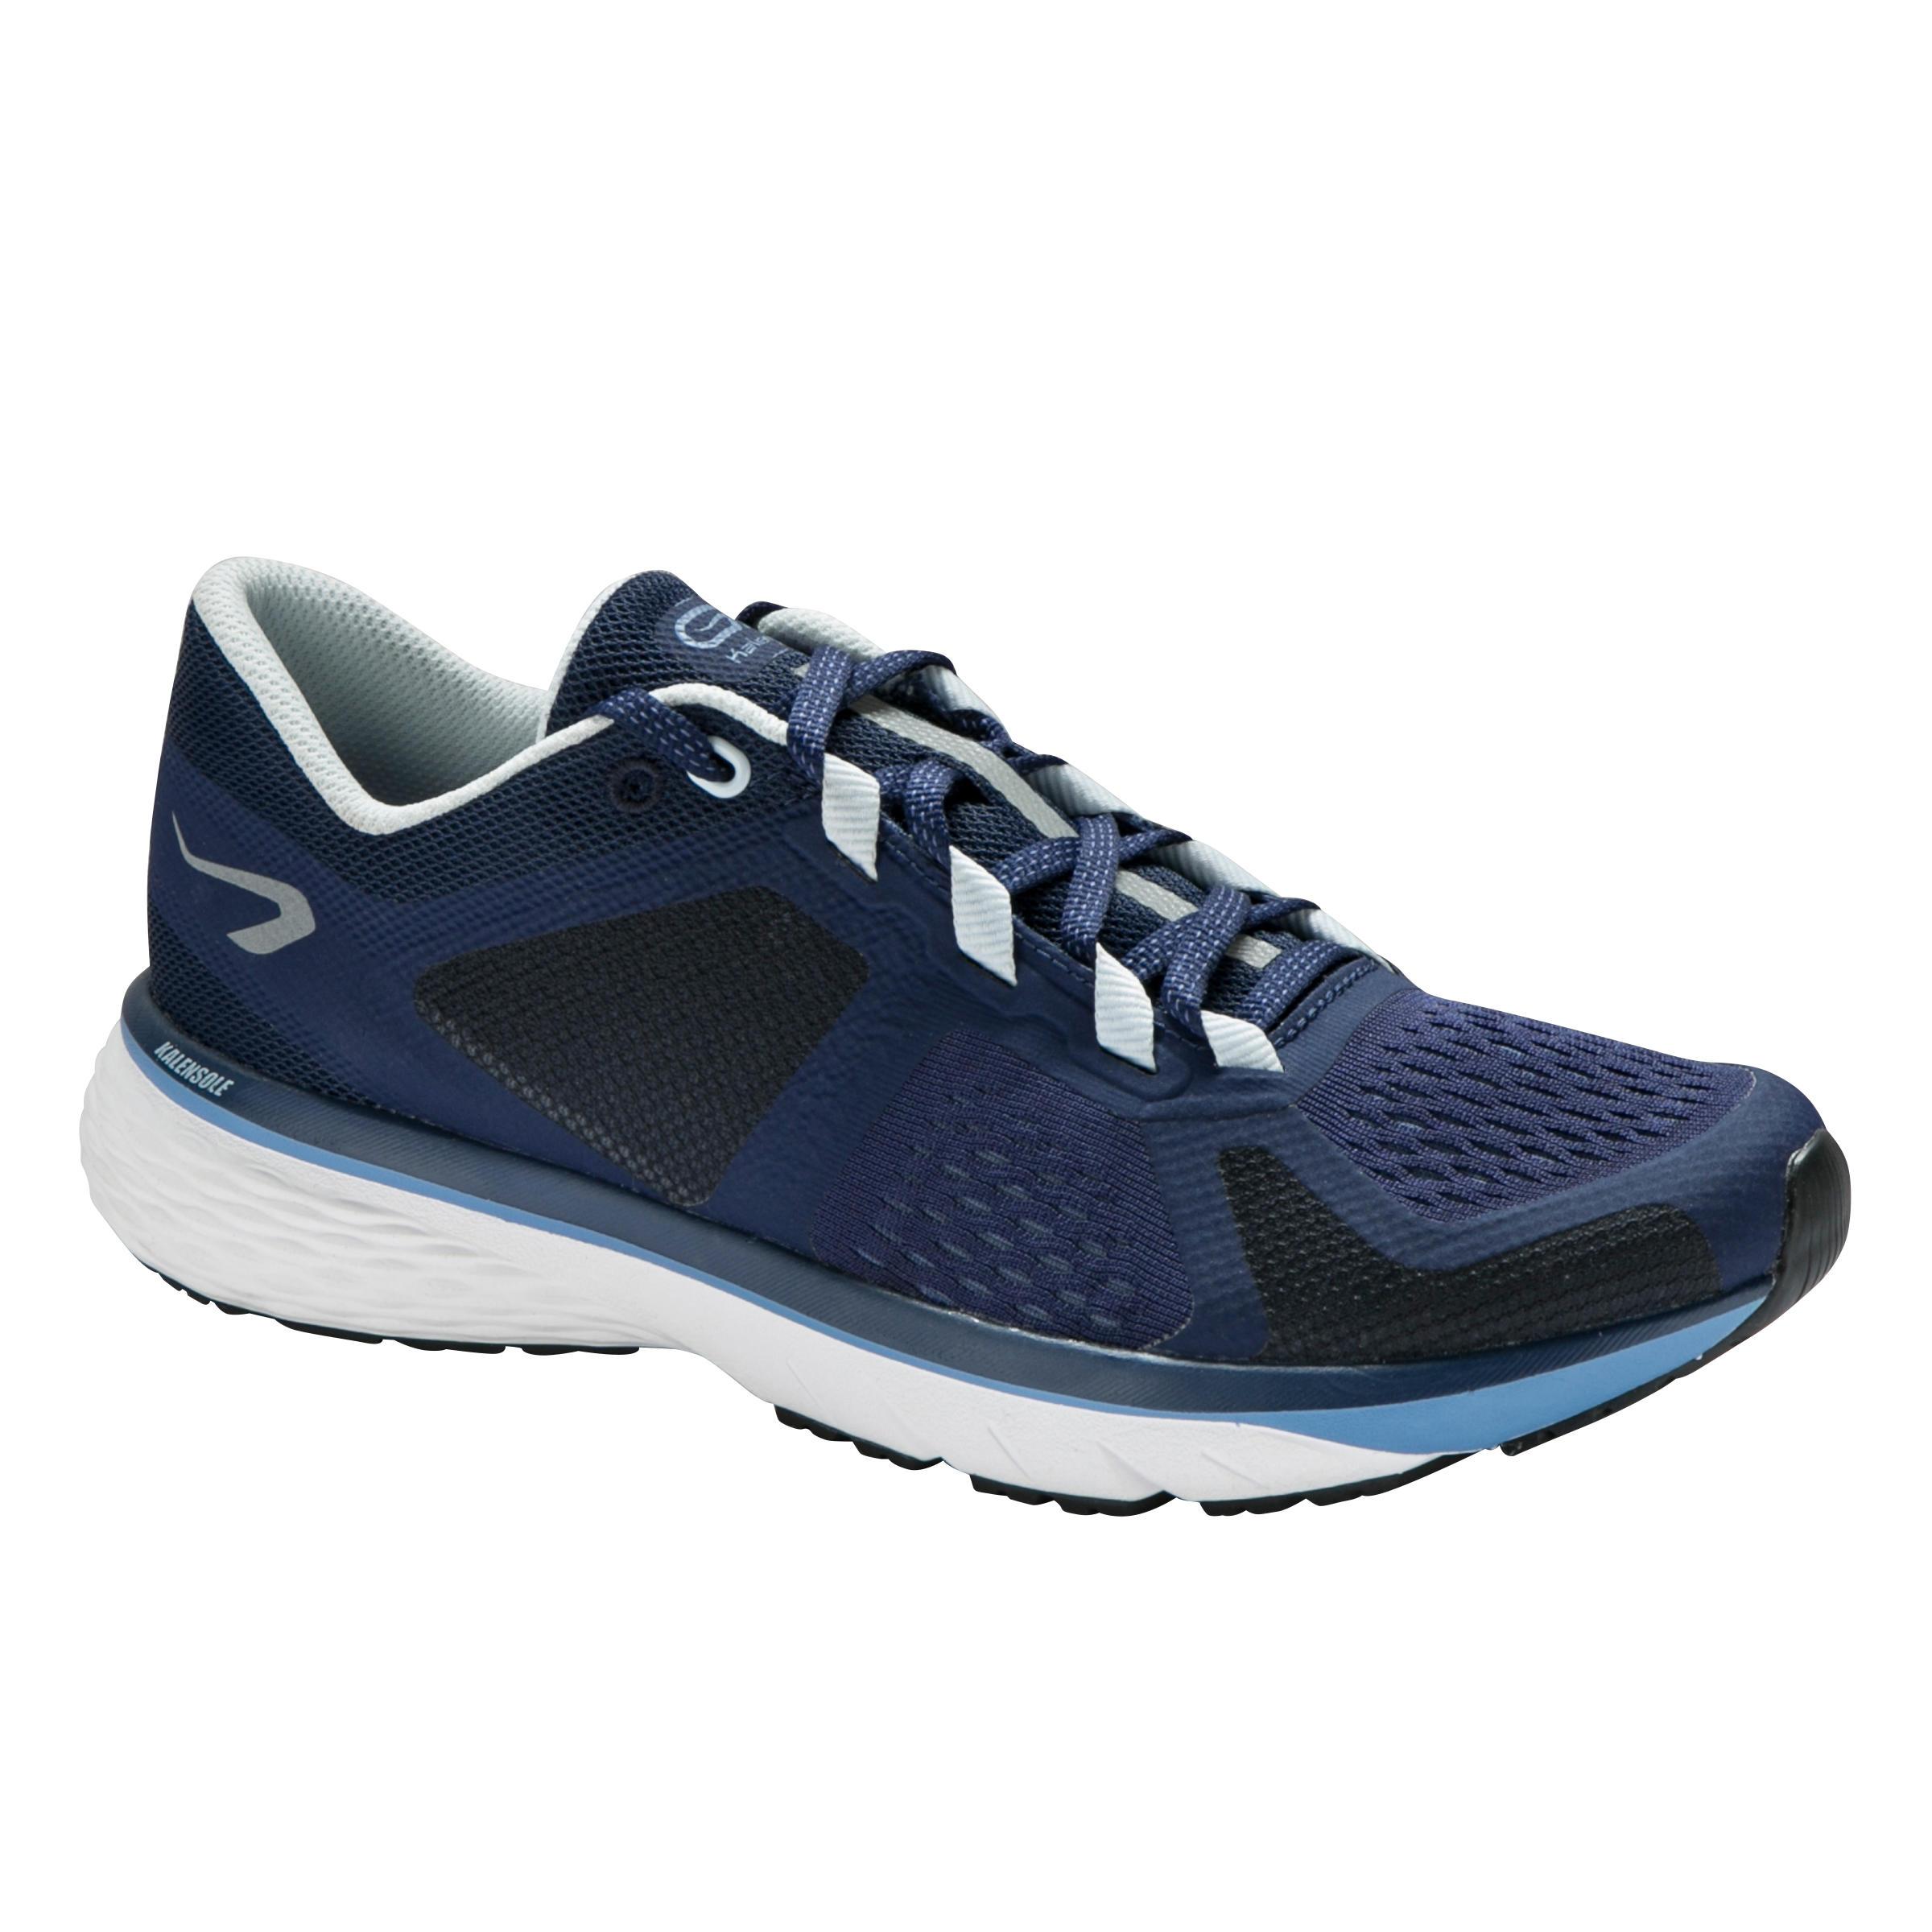 Laufschuhe Run Support Control Damen dunkelblau